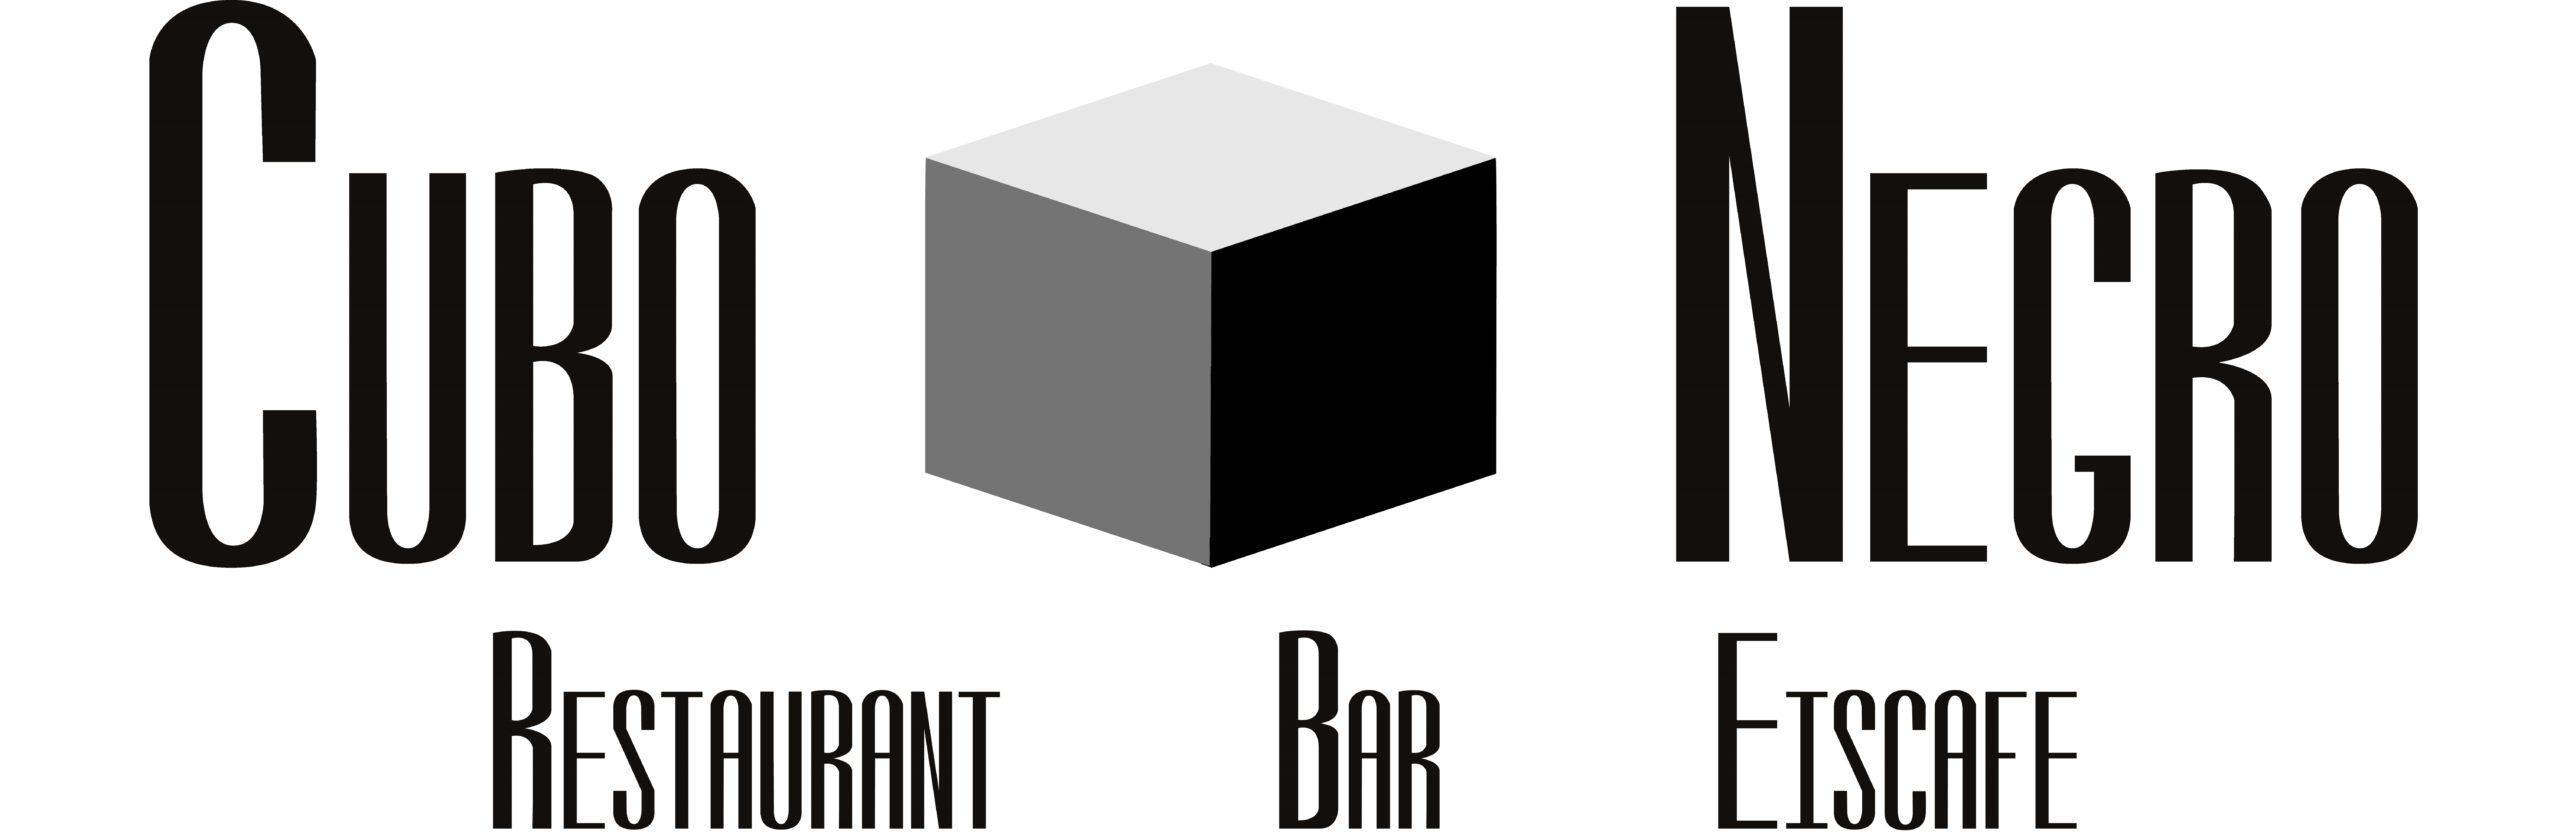 Cubo Negro